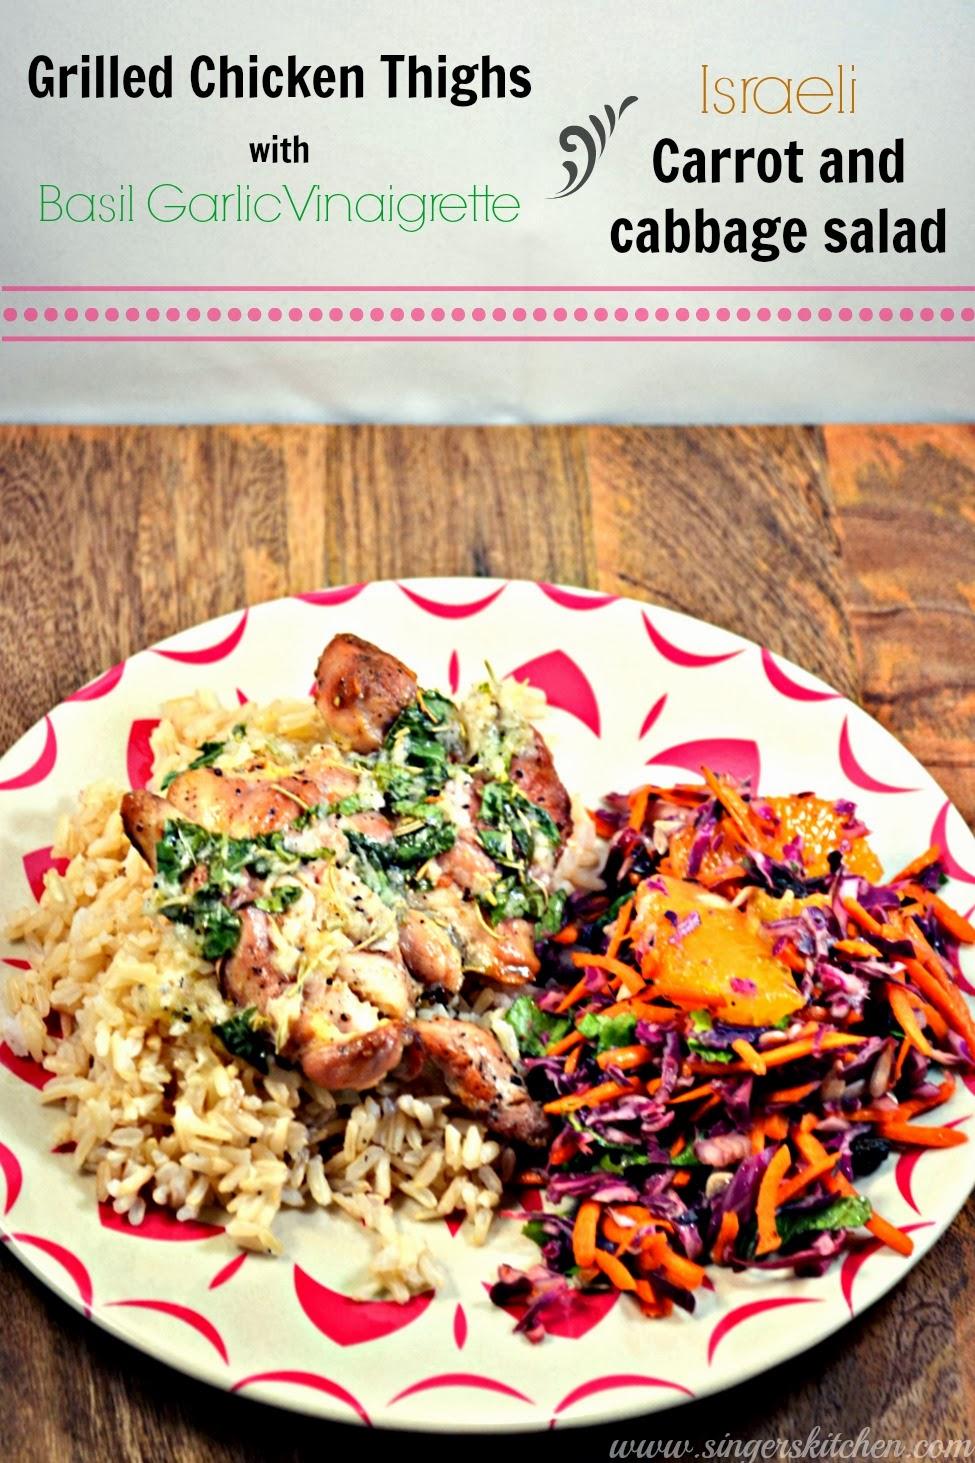 Adventurous Vegetarian Cookbook Review / Giveaway - Opera Singer in ...